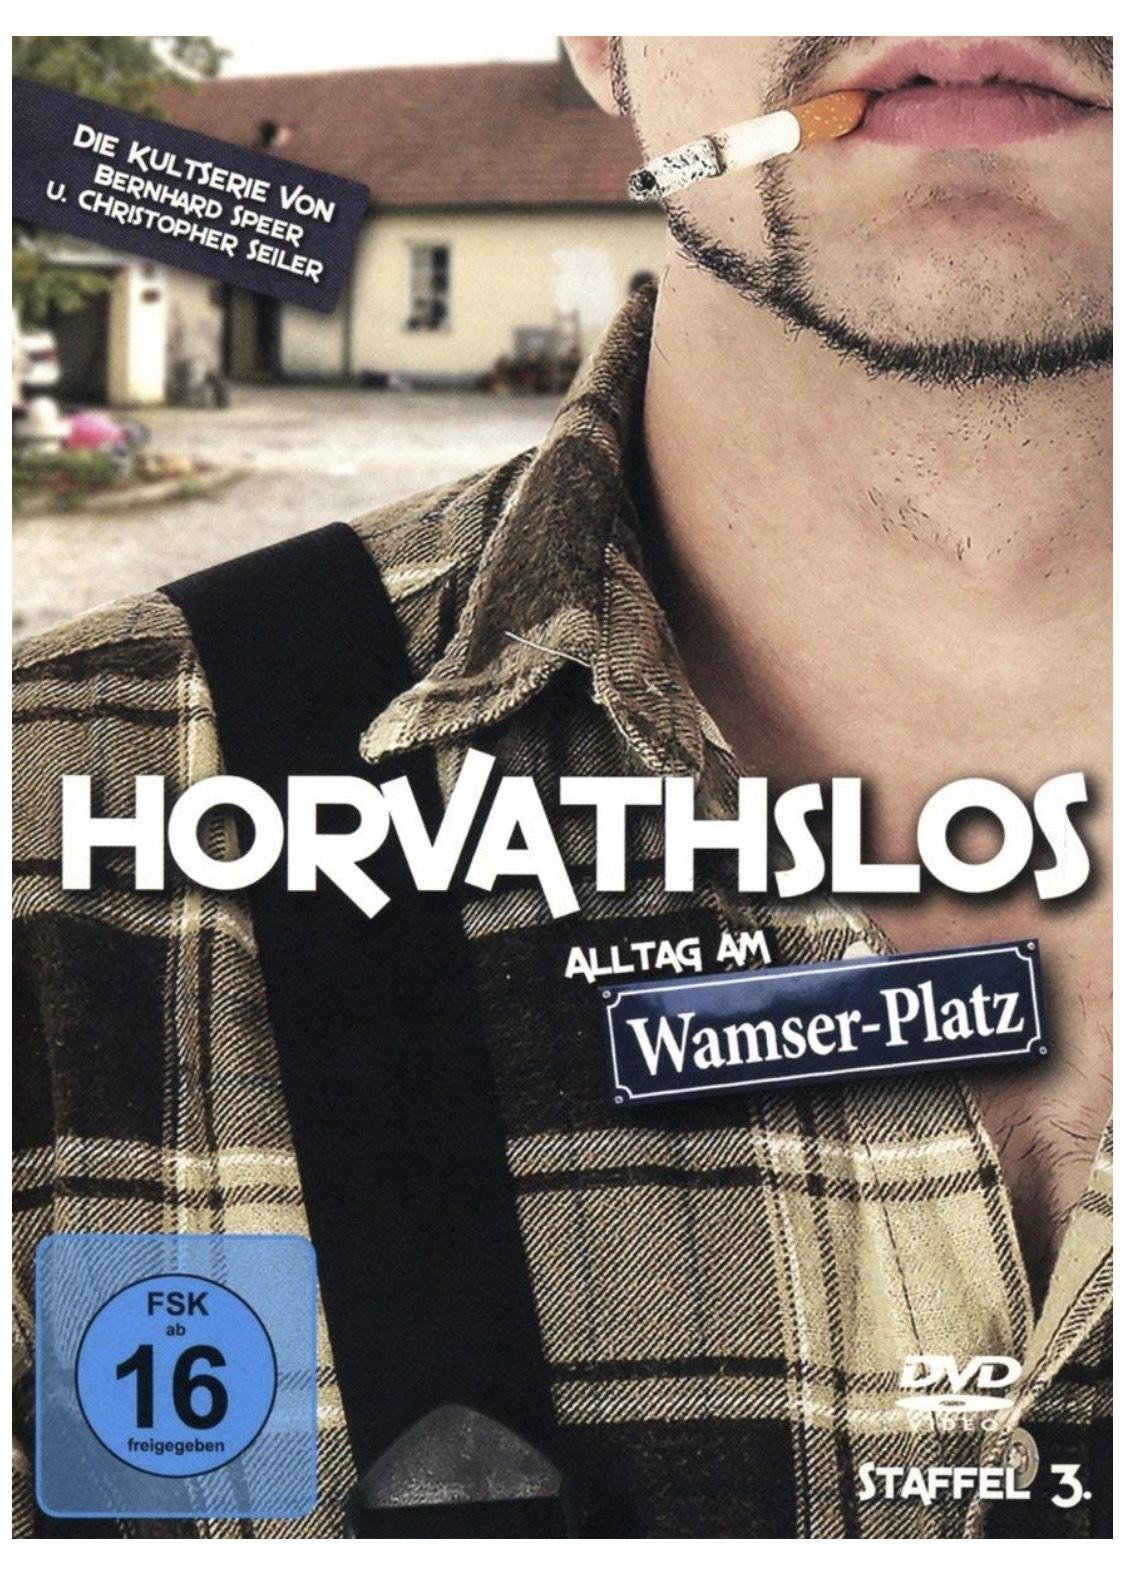 Horvathslos - Staffel 3